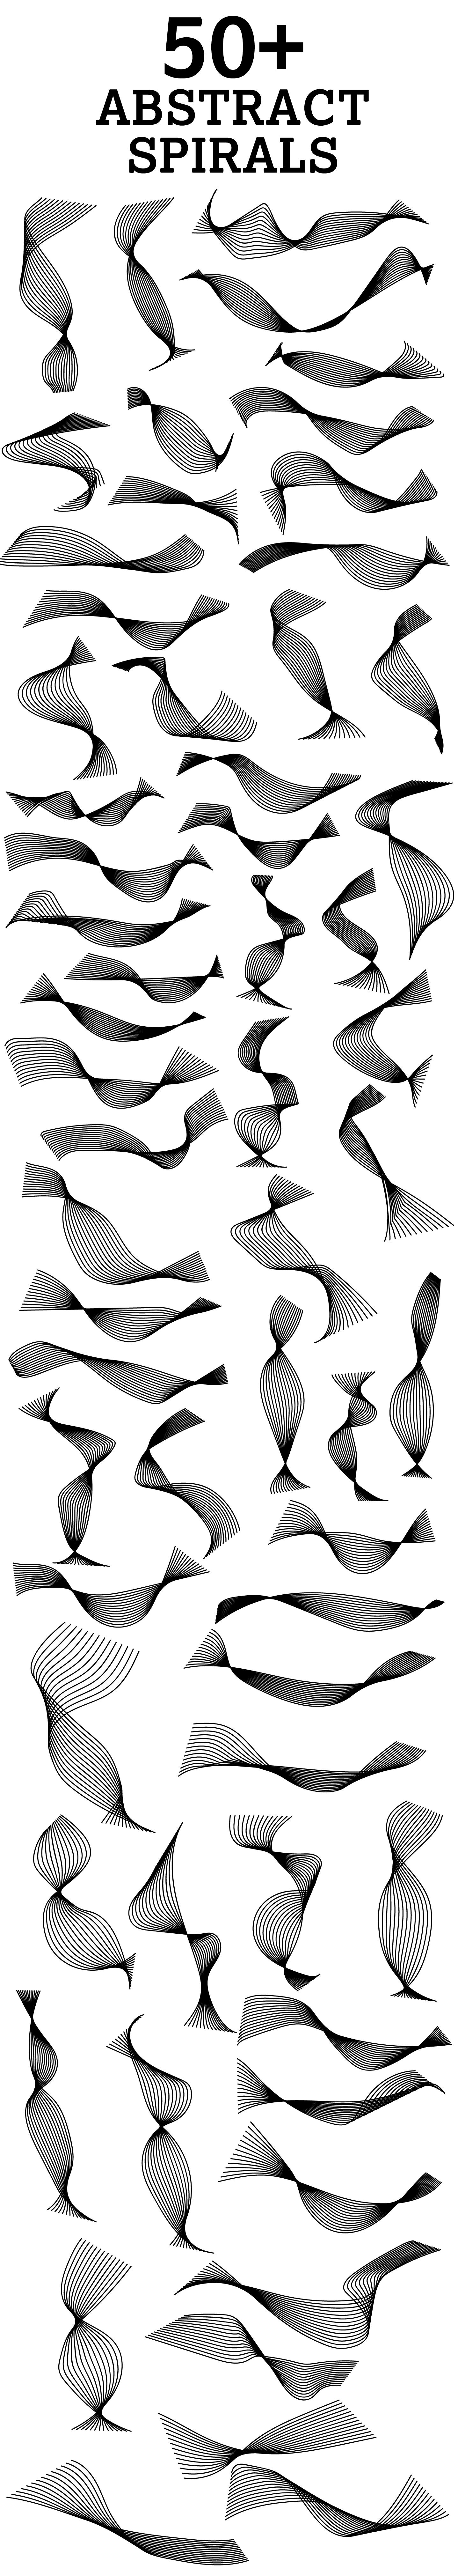 50 abstarct spirals 1 50+ Abstract spirals vectors